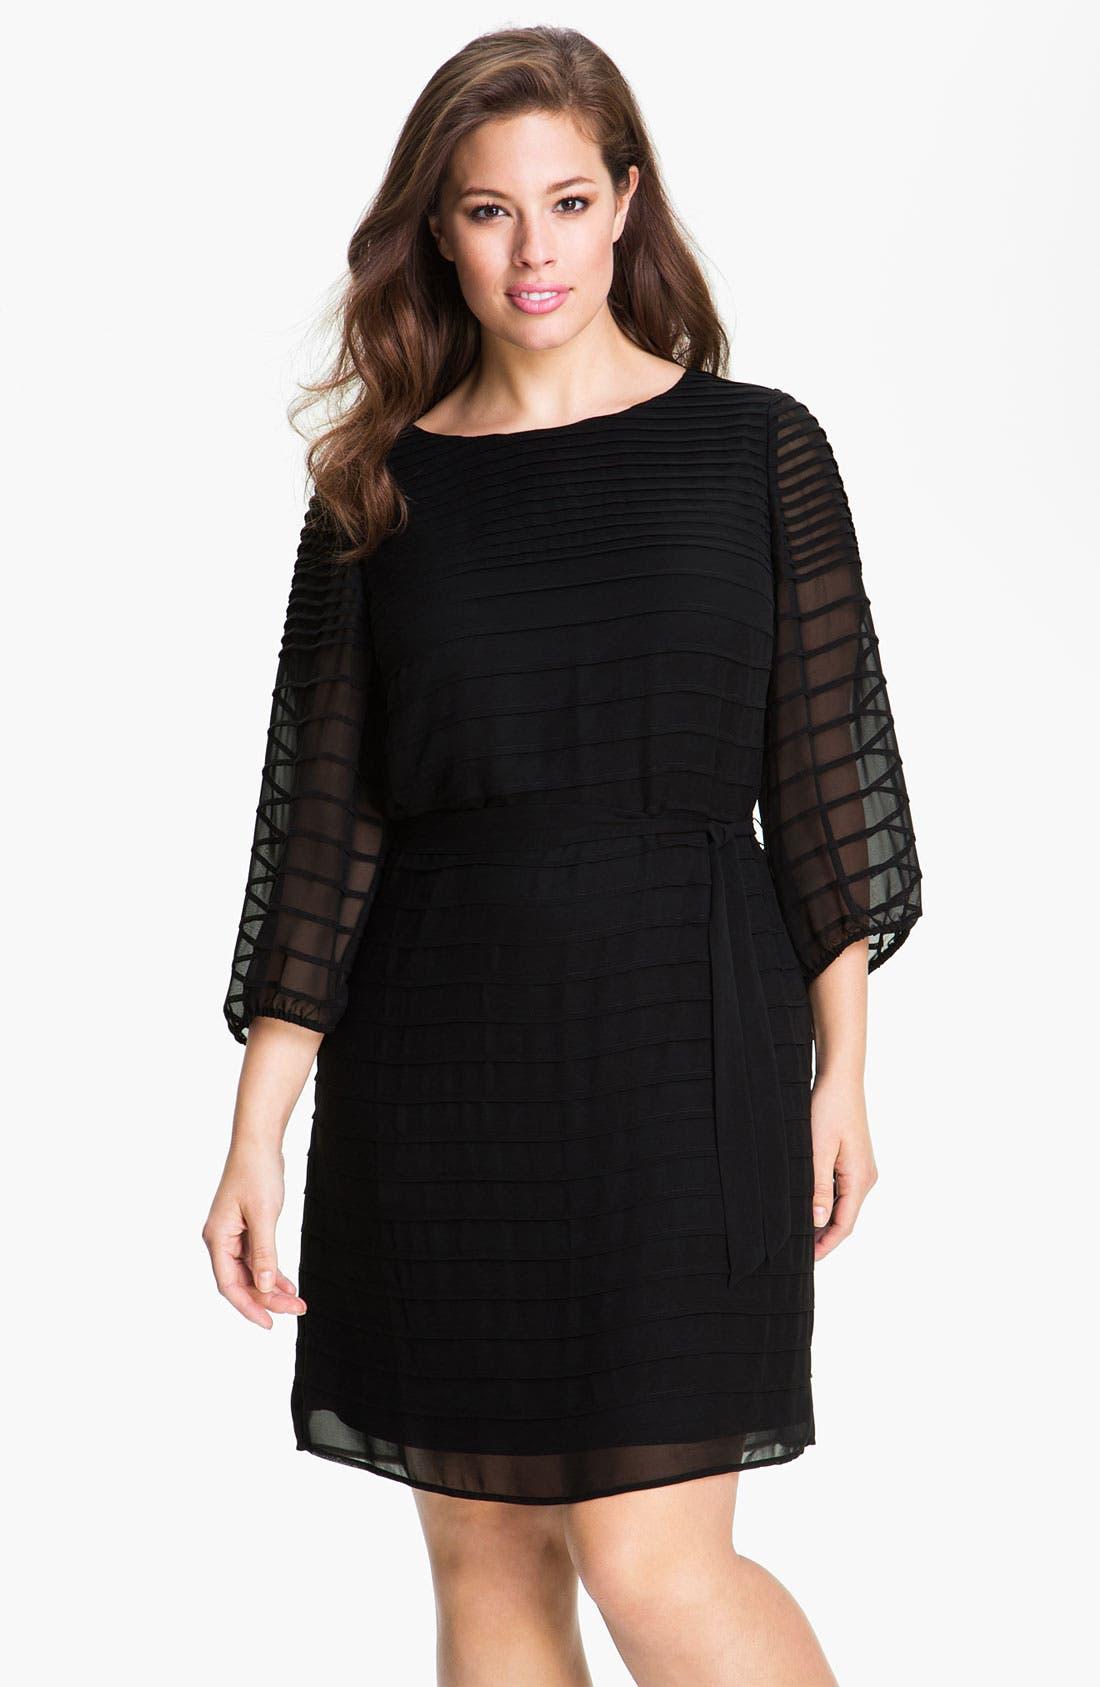 Alternate Image 1 Selected - Calvin Klein Belted Pintuck Chiffon Dress (Plus)